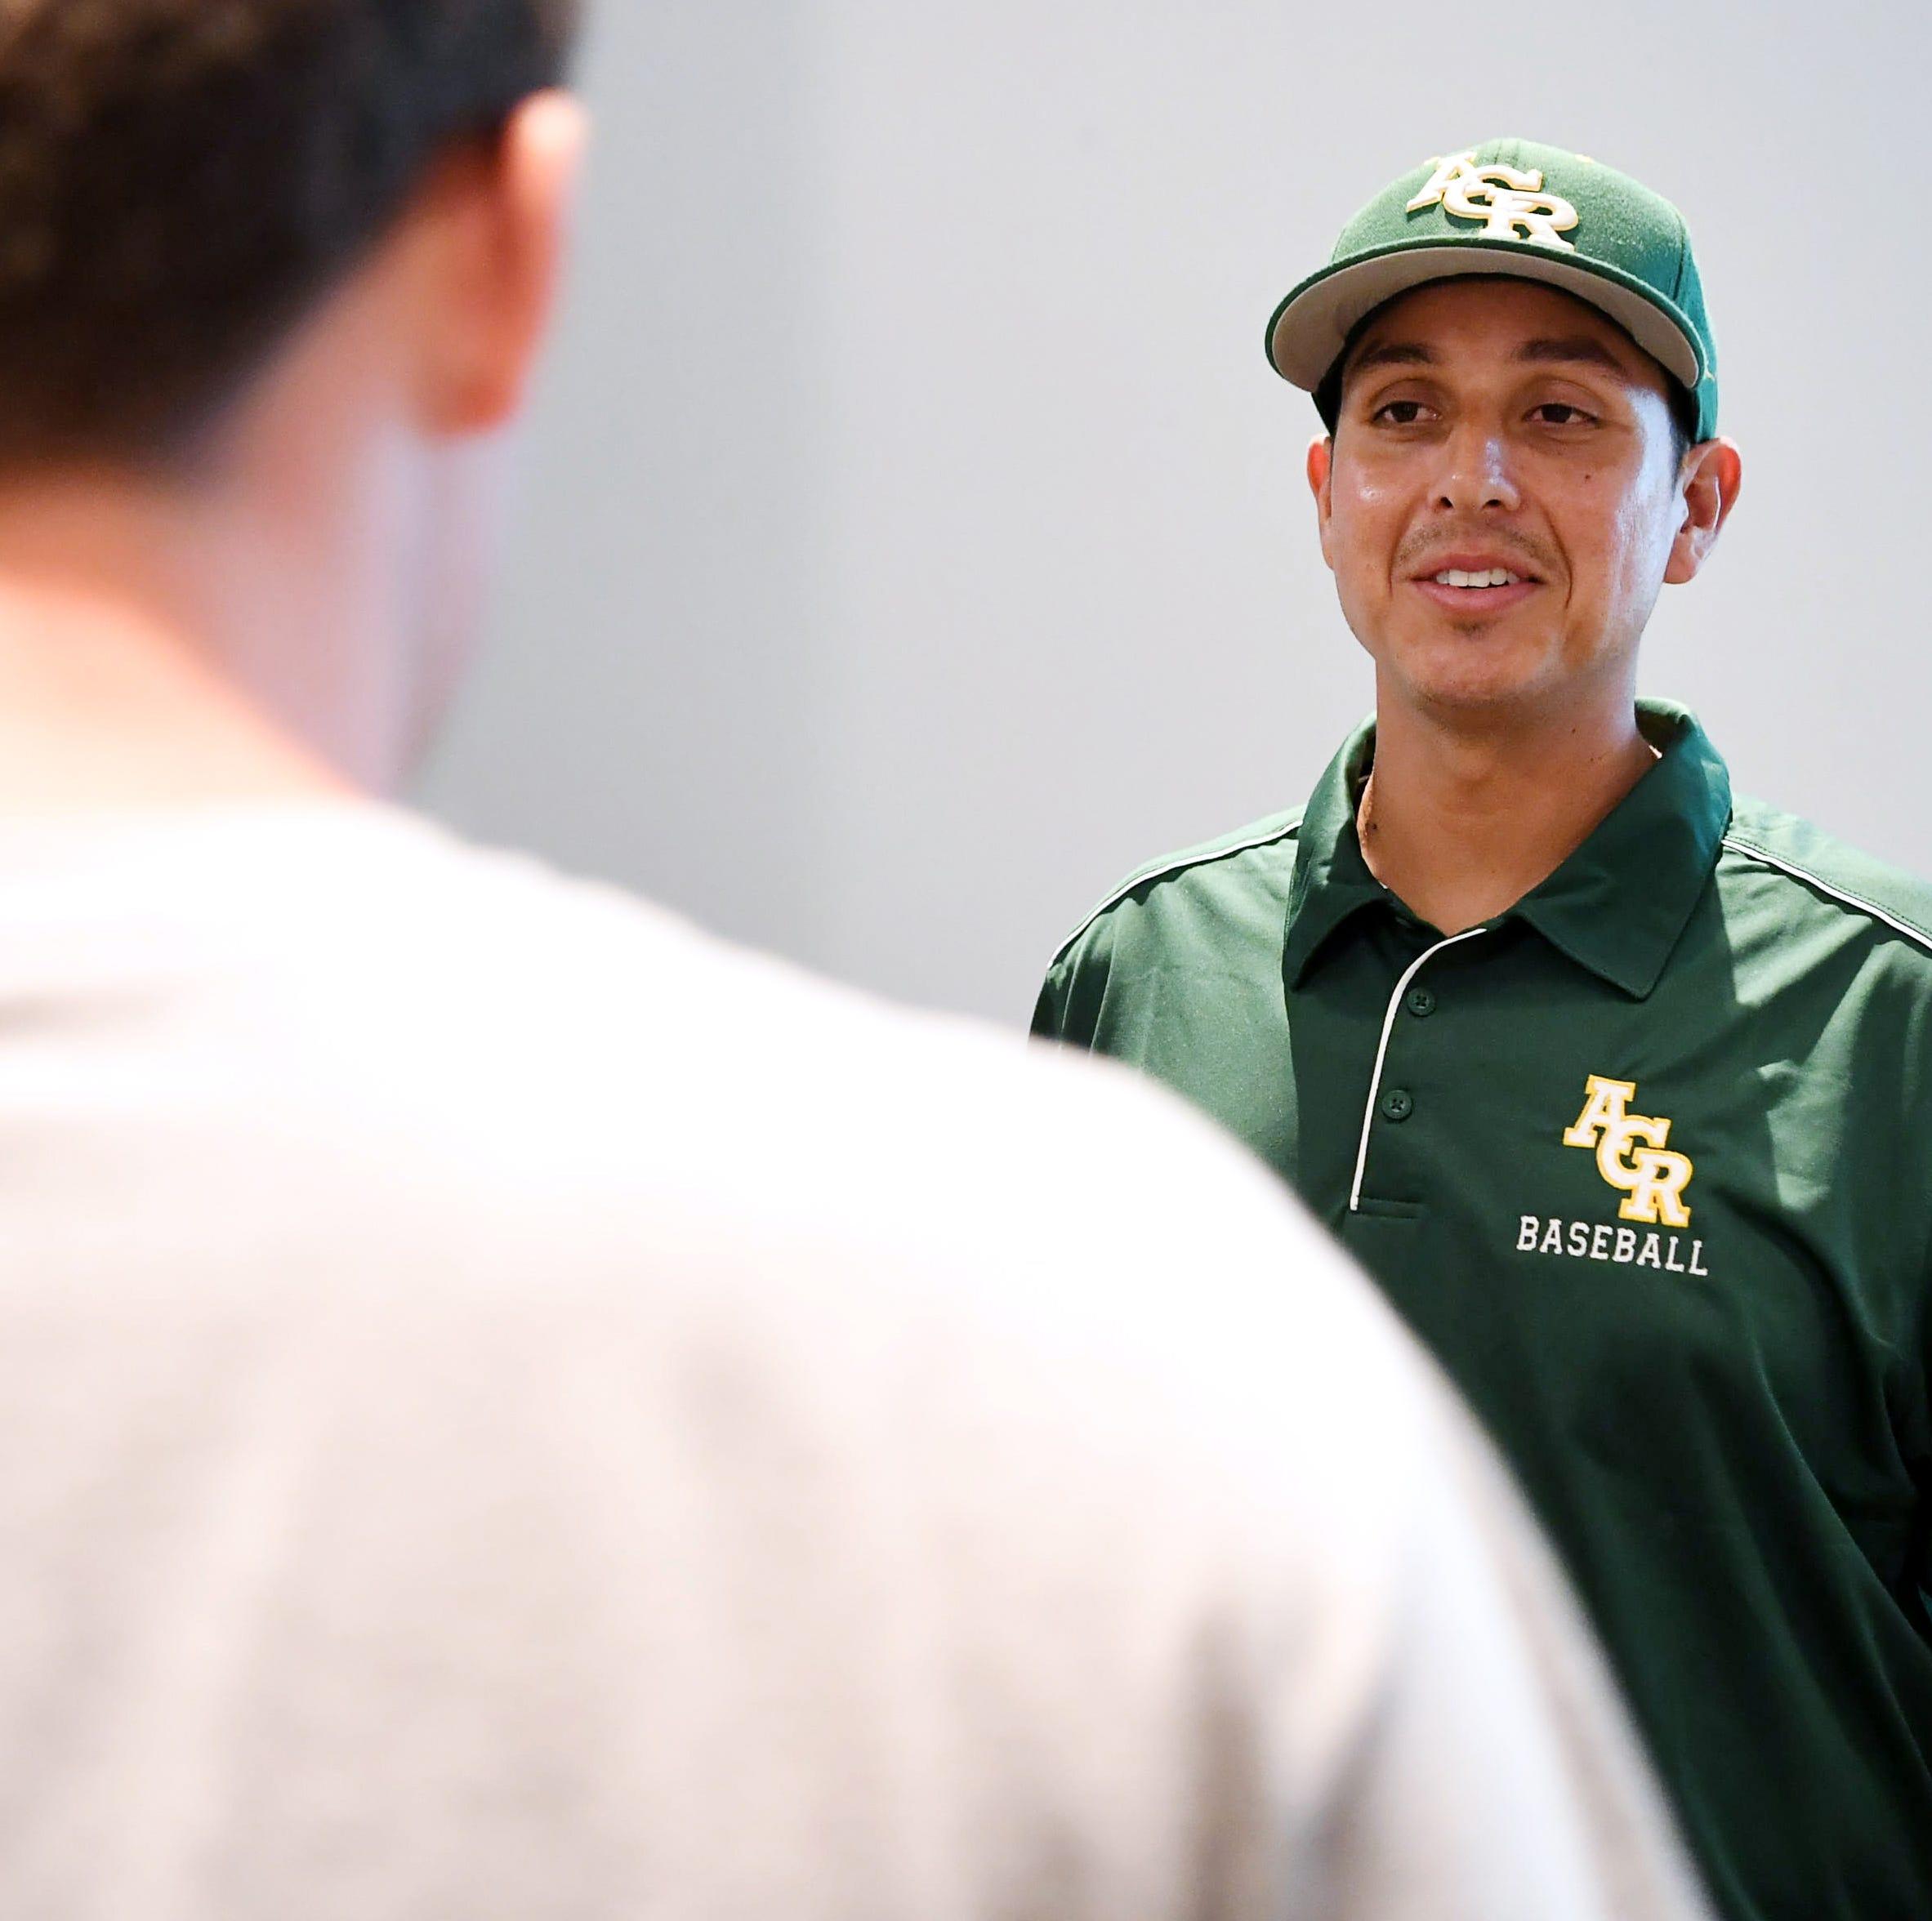 Reynolds hires new baseball coach